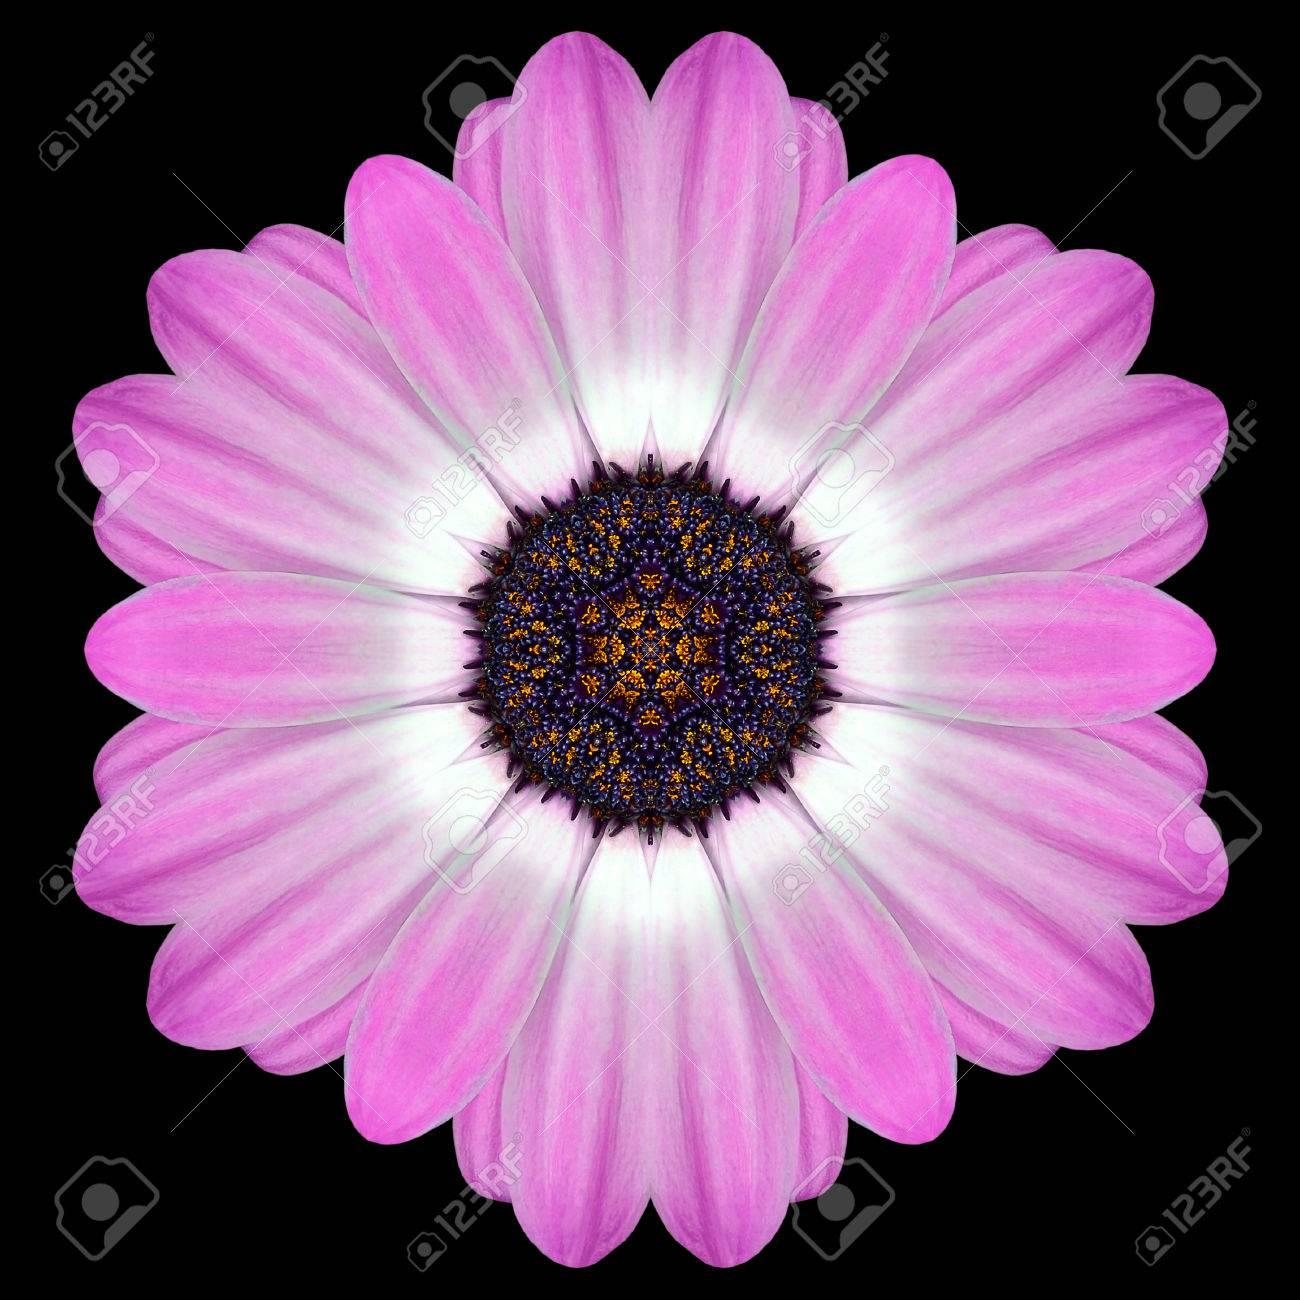 Pink purple mandala of daisy flower with dark center kaleidoscopic pink purple mandala of daisy flower with dark center kaleidoscopic design isolated on black background izmirmasajfo